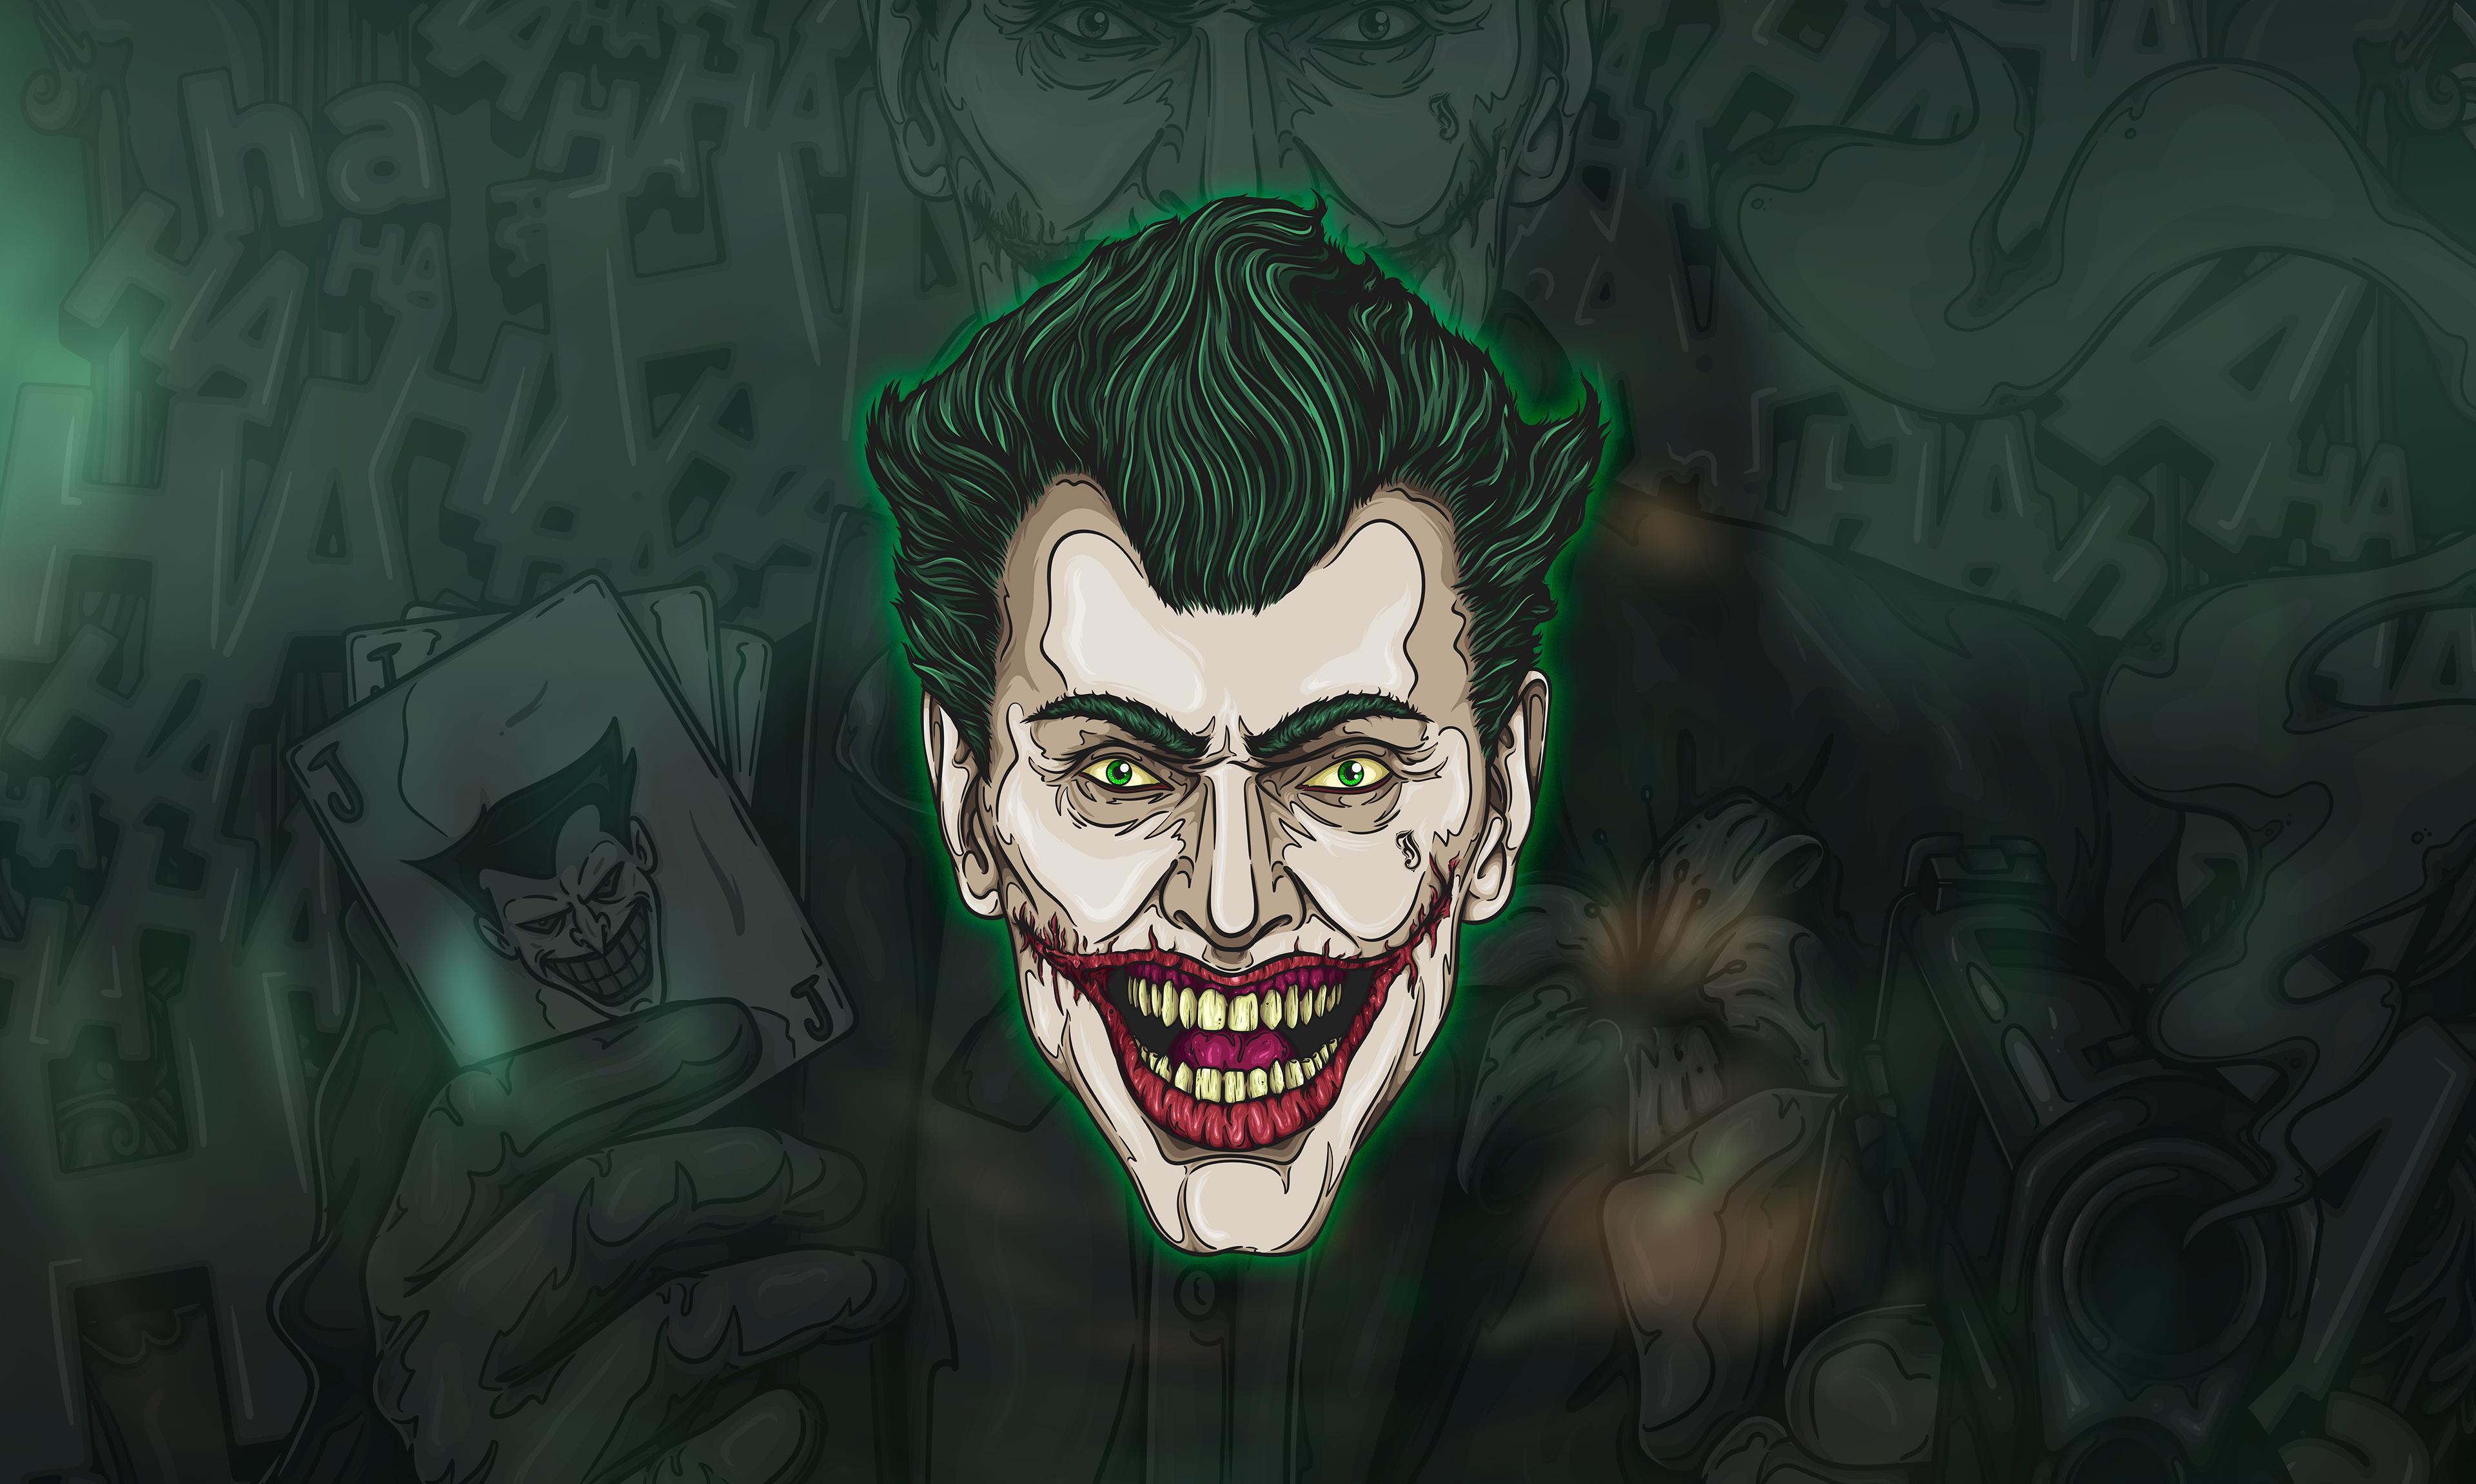 Joker Face Art HD Superheroes 4k Wallpapers Images Backgrounds